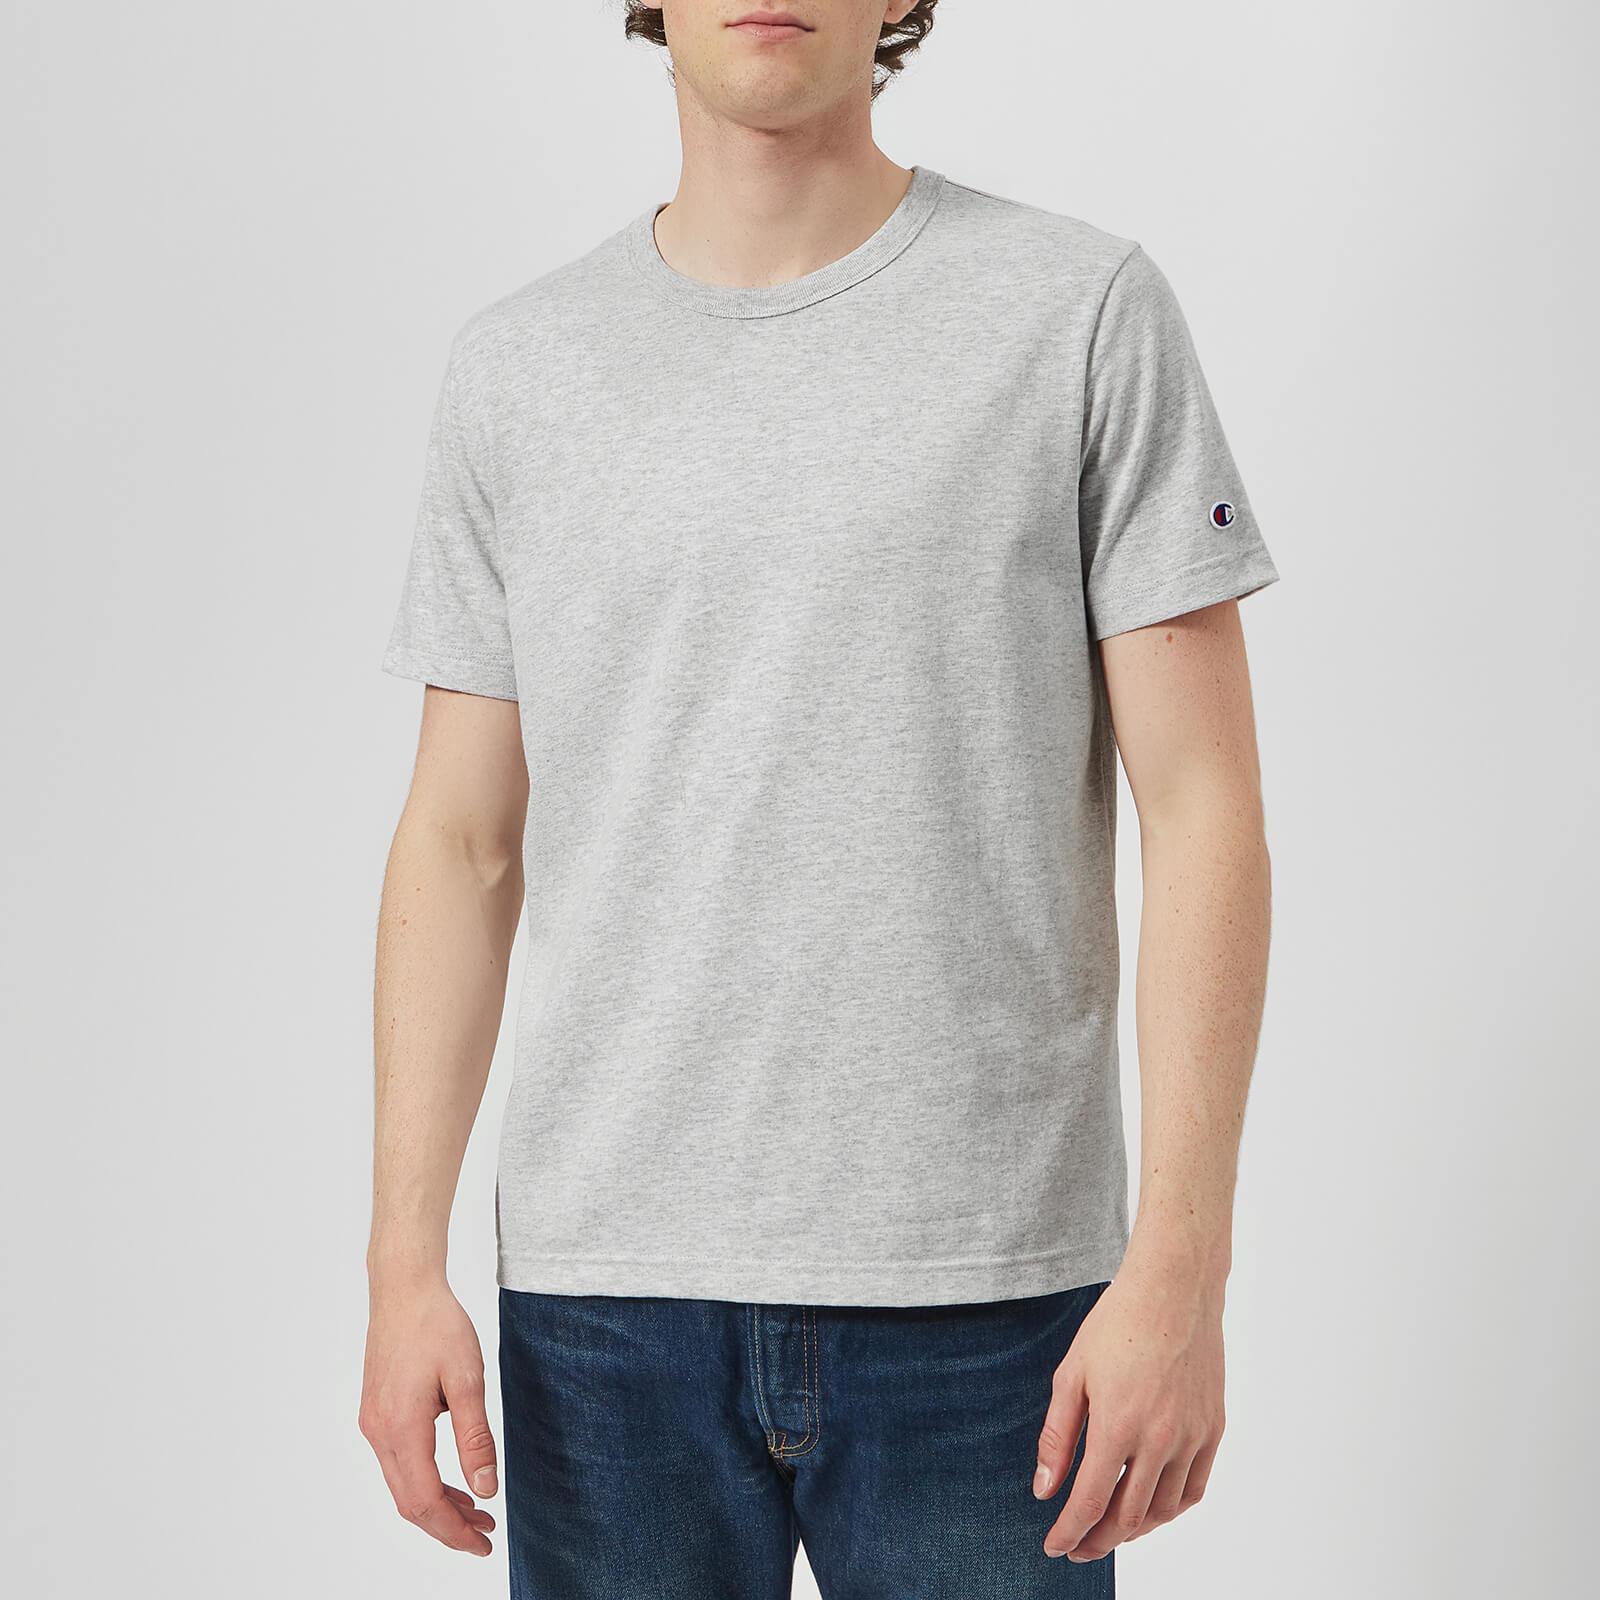 Champion Men's Crew Neck T-Shirt - Grey - XS